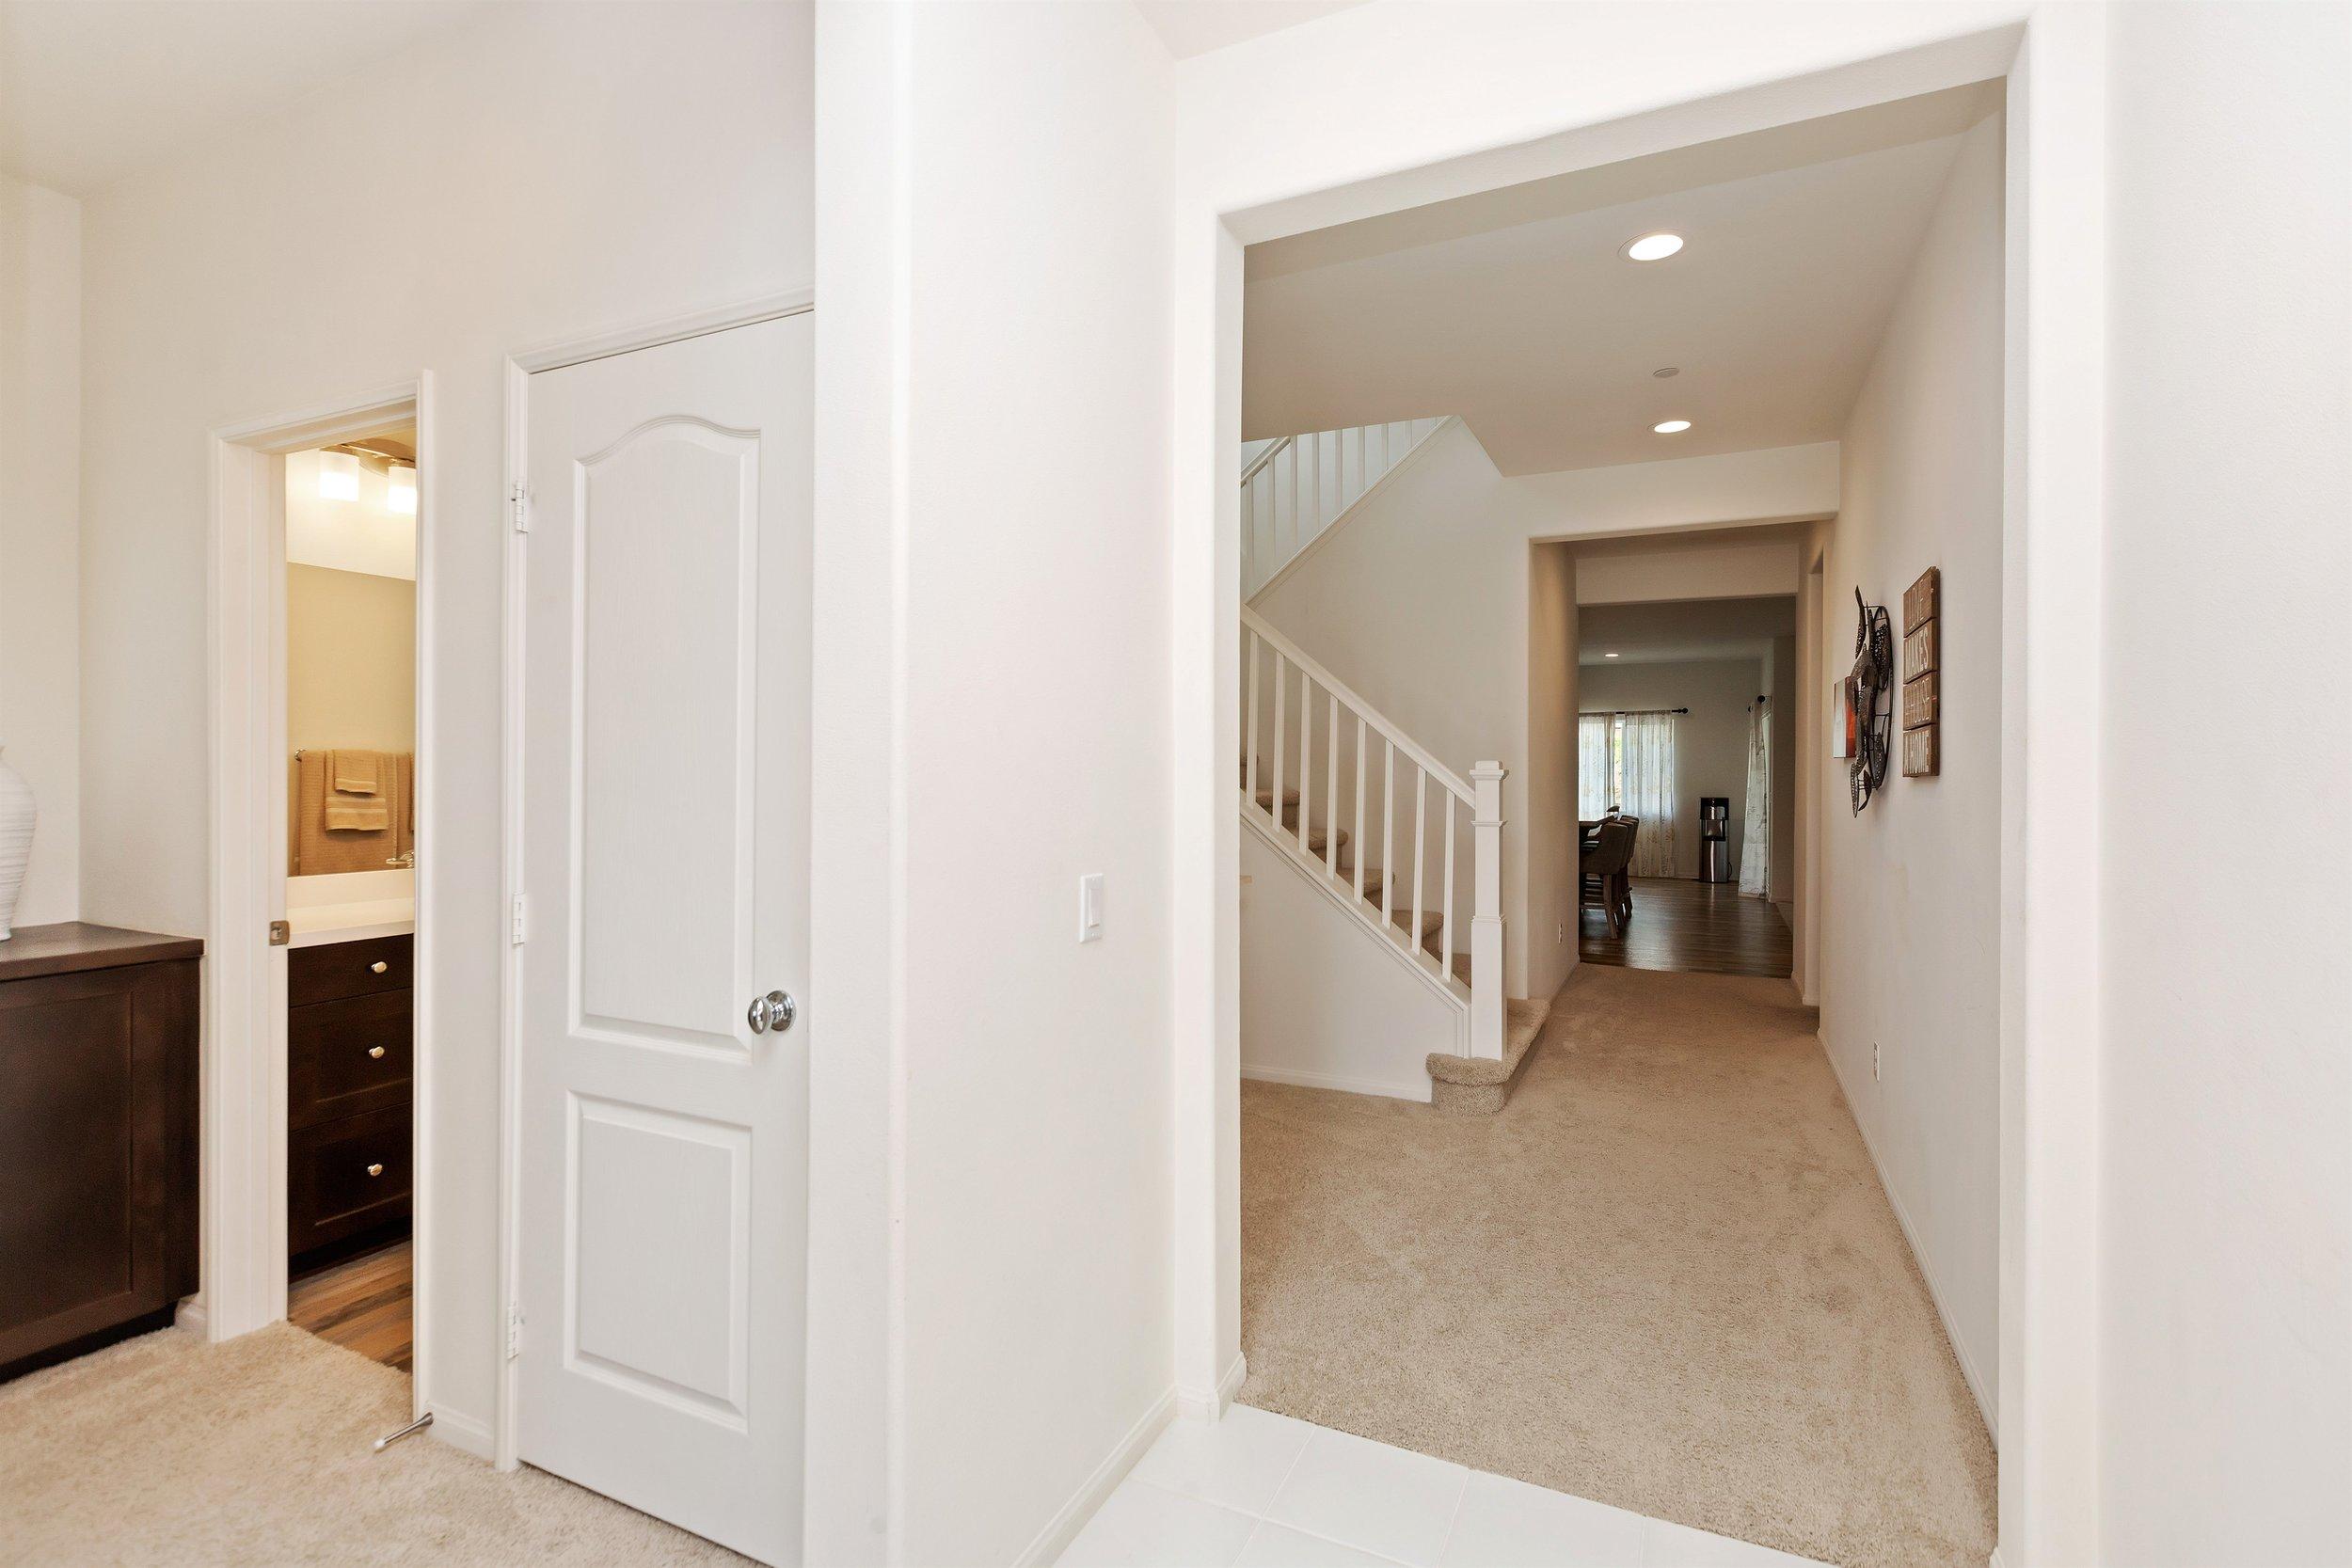 007_Hallway.jpg